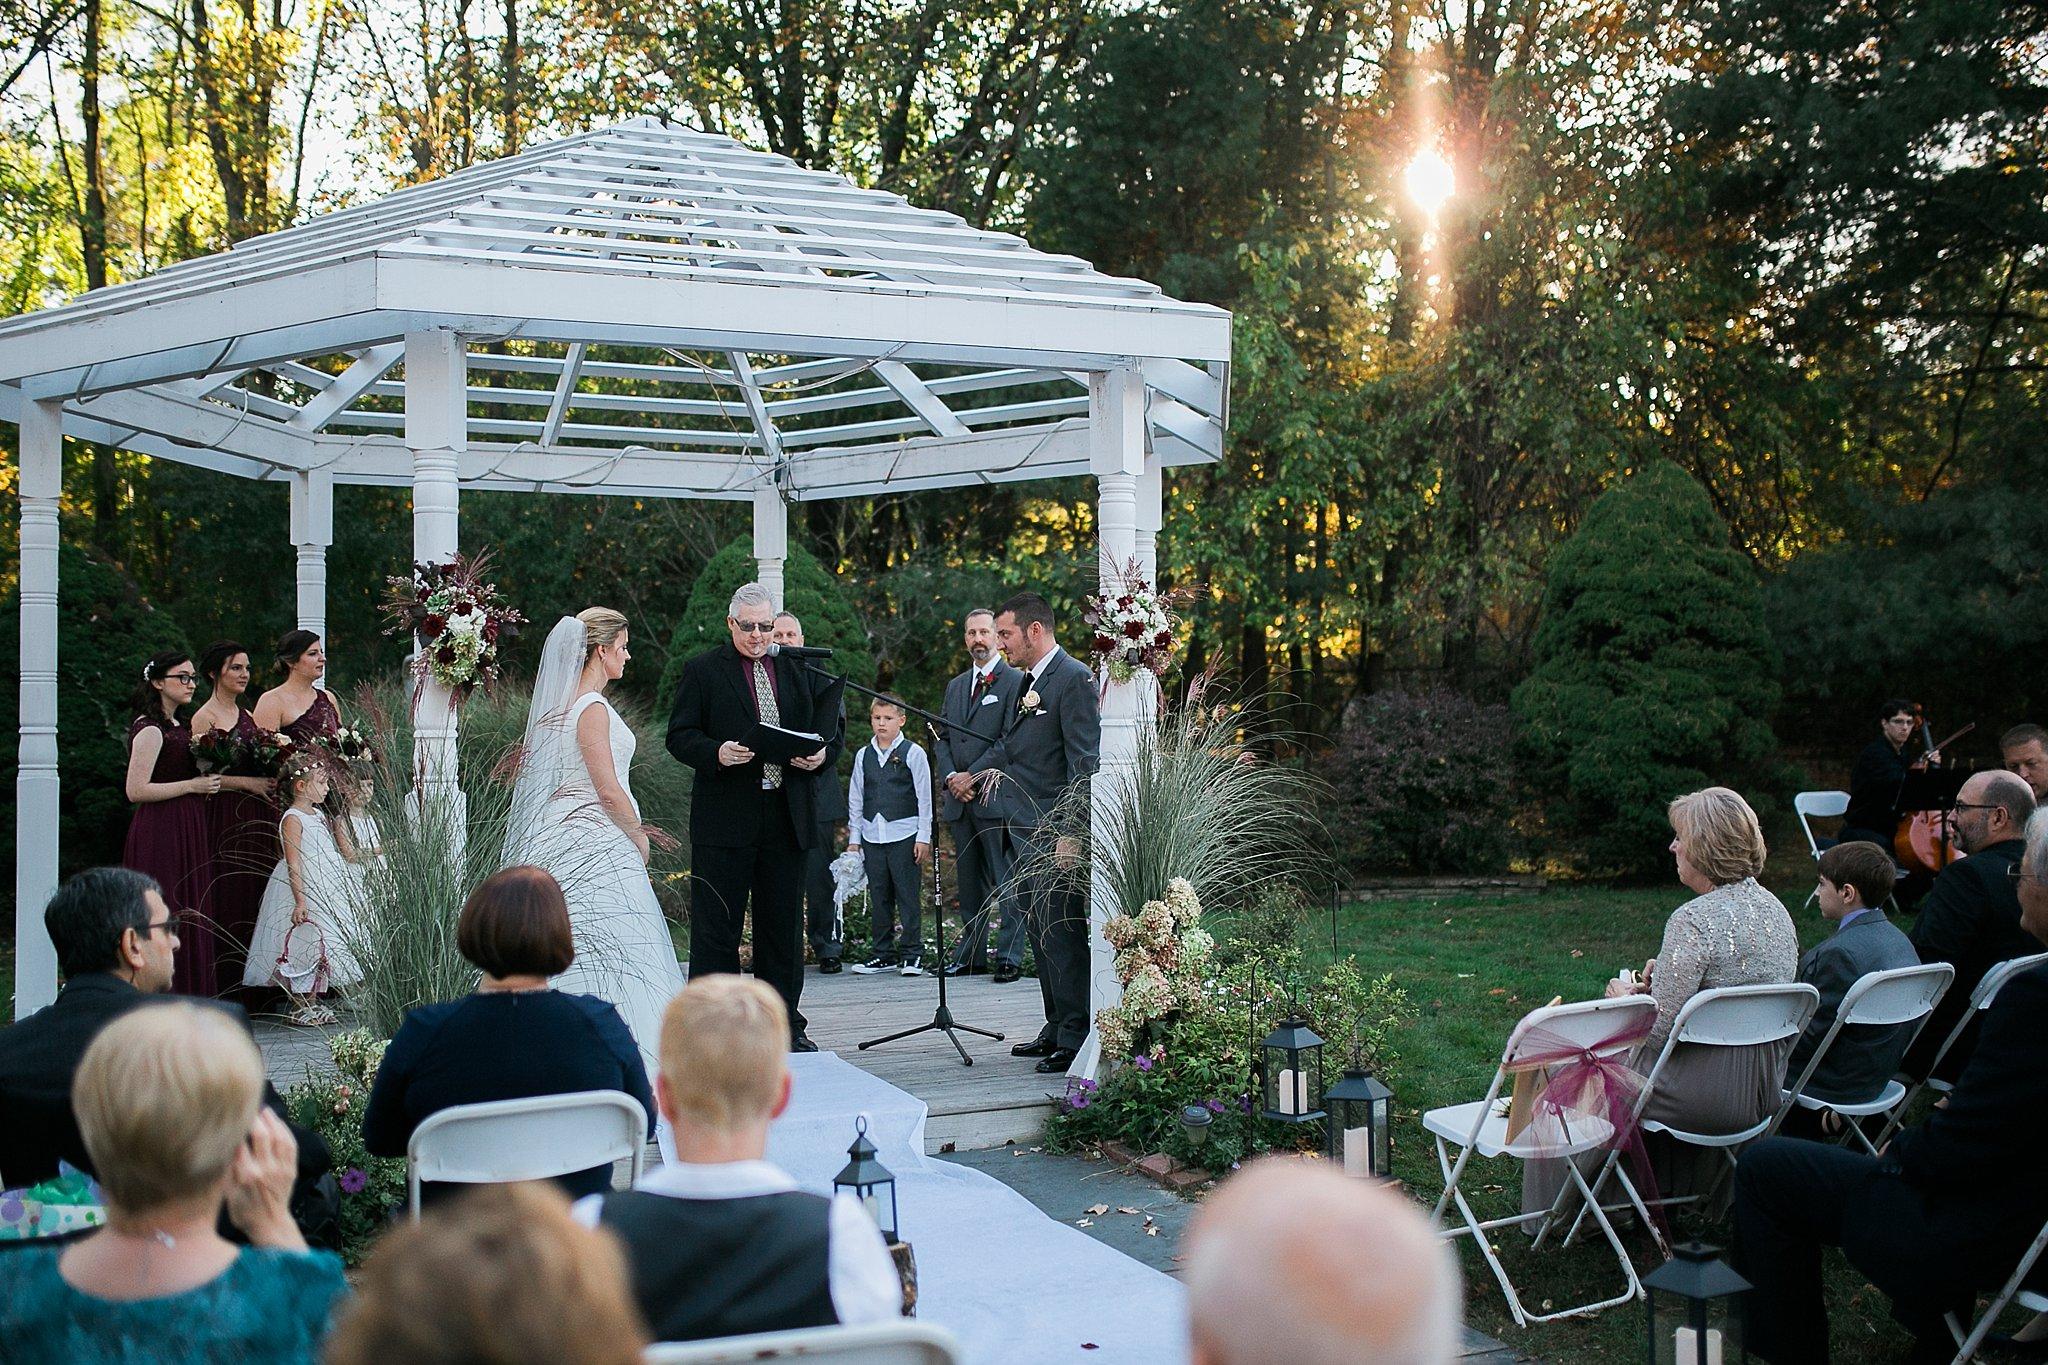 New Windsor New York Hudson Valley New York Wedding Photographer 39.jpg